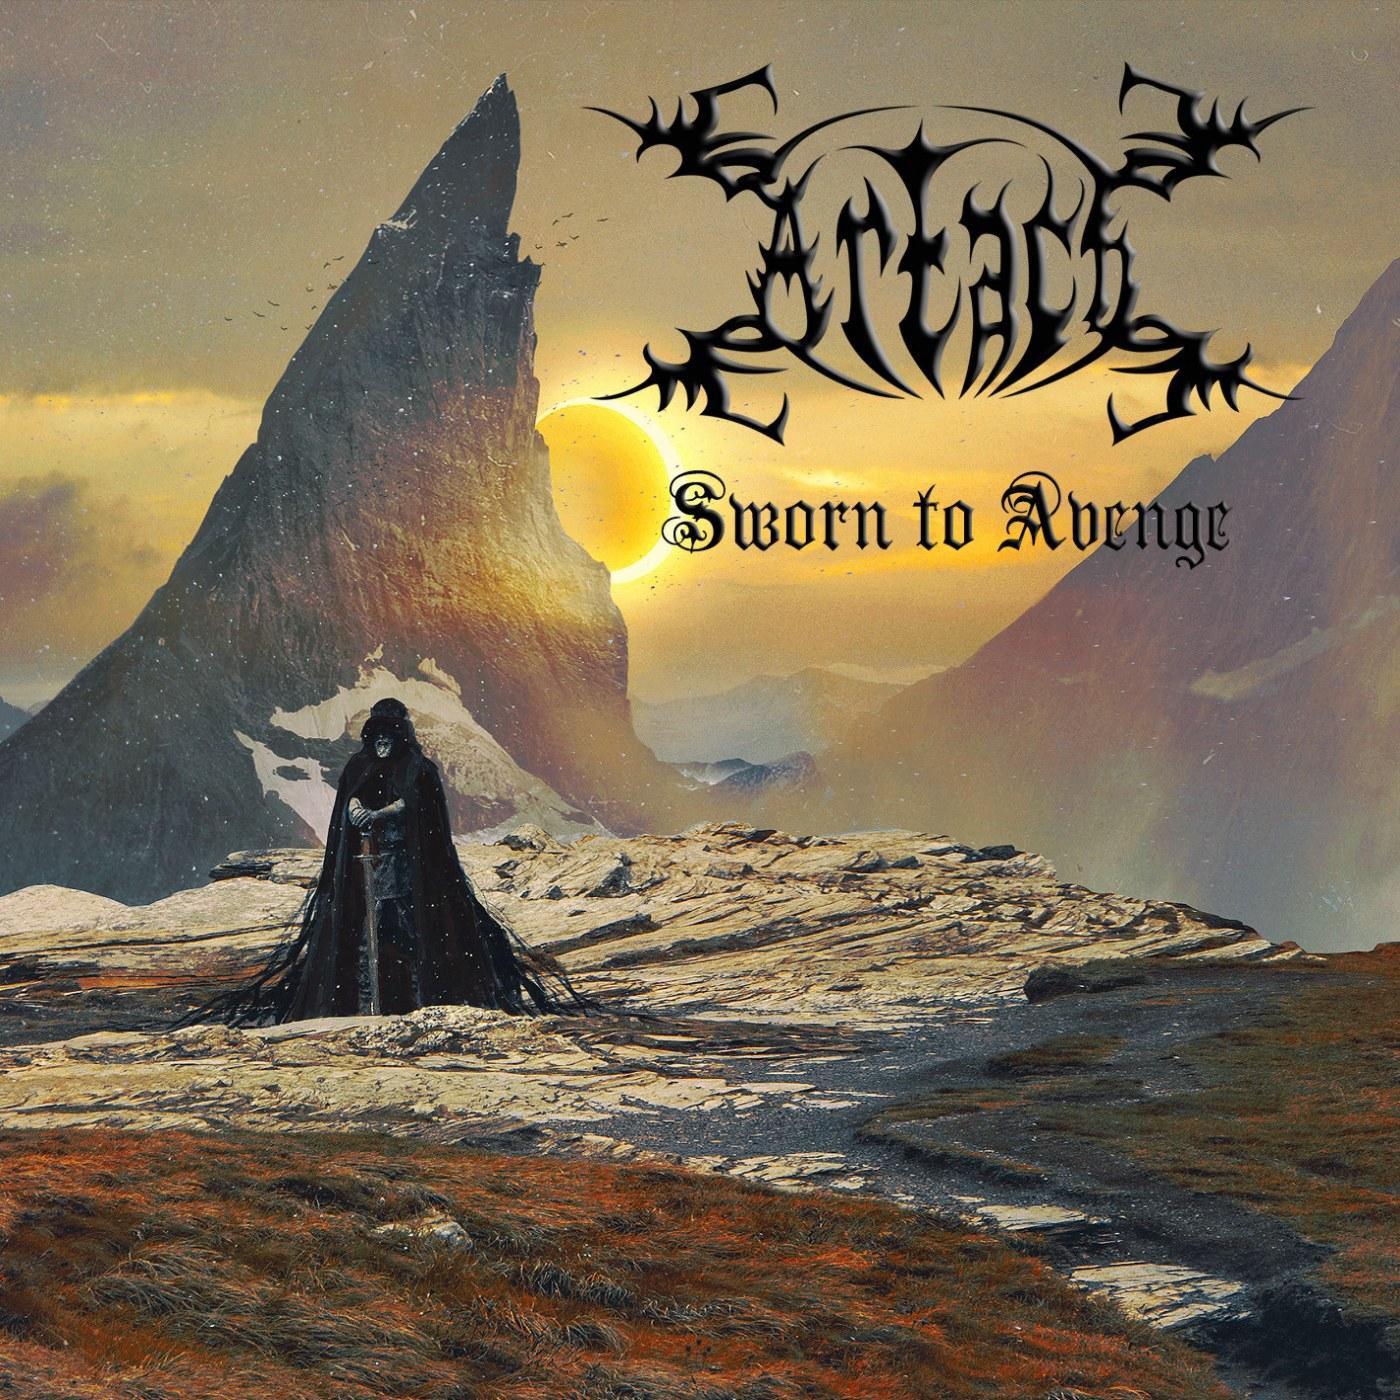 Artach - Sworn to Avenge